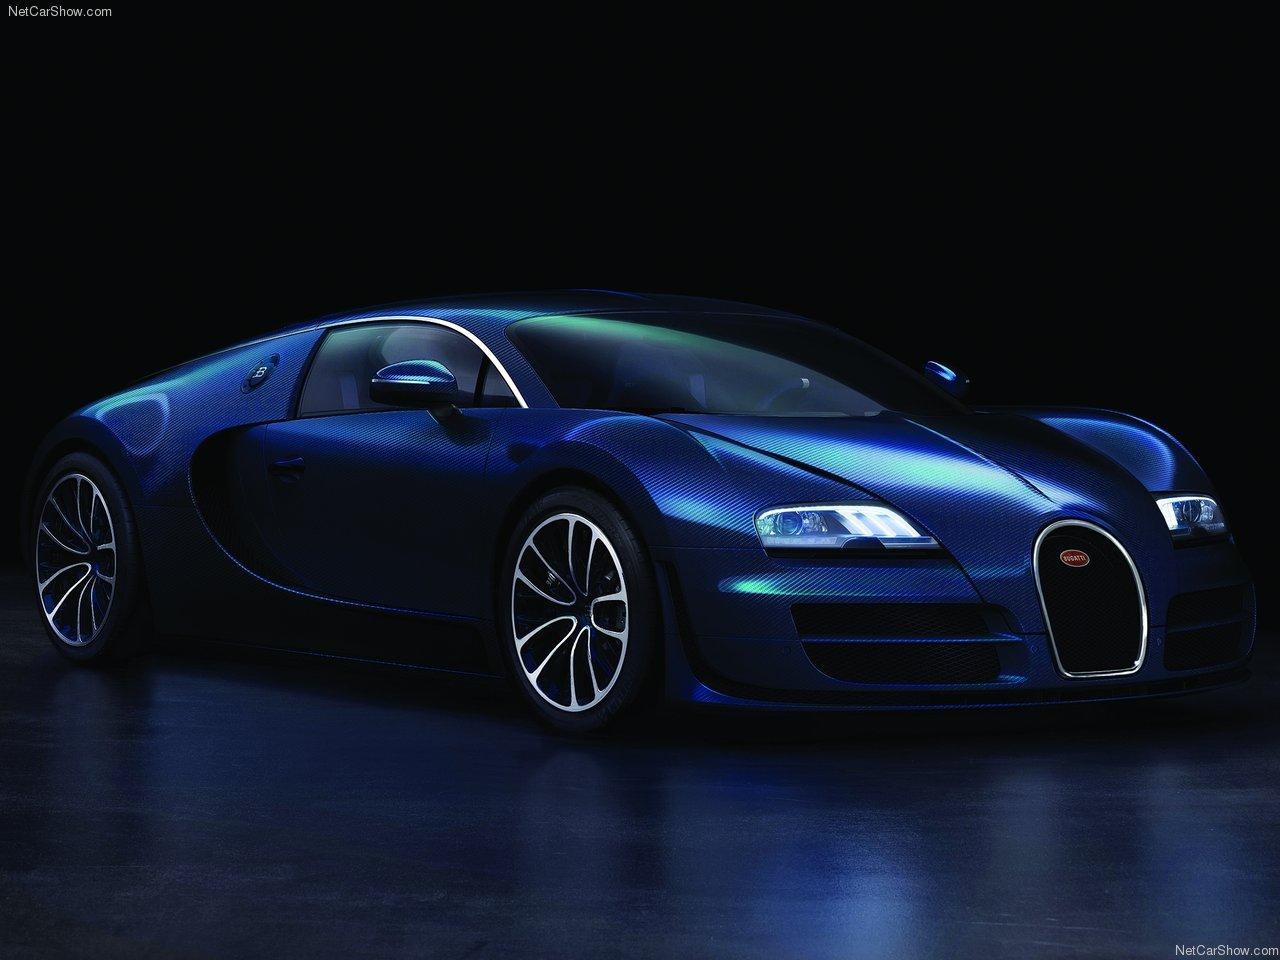 Pic New Posts: Wallpaper Bugatti Veyron Super Sport